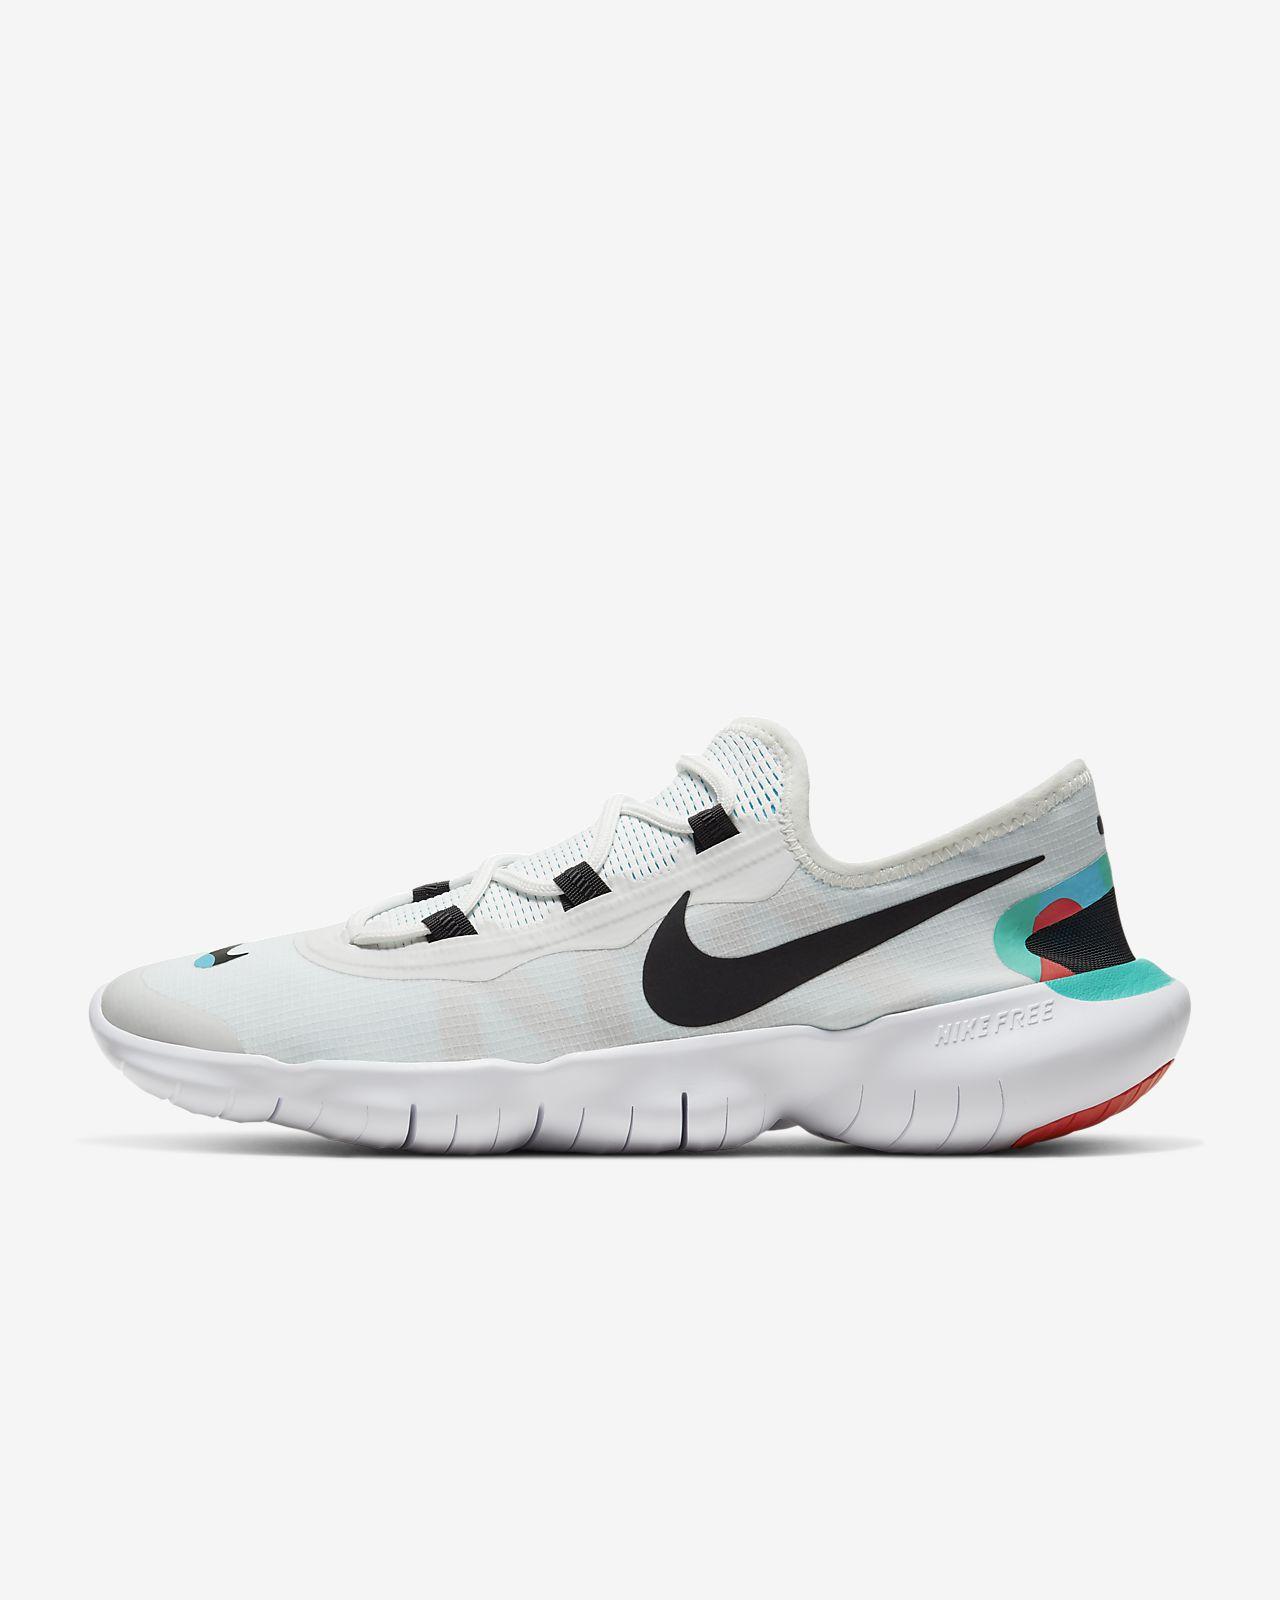 Nike Free RN 5.0 2020 AS 男子跑步鞋